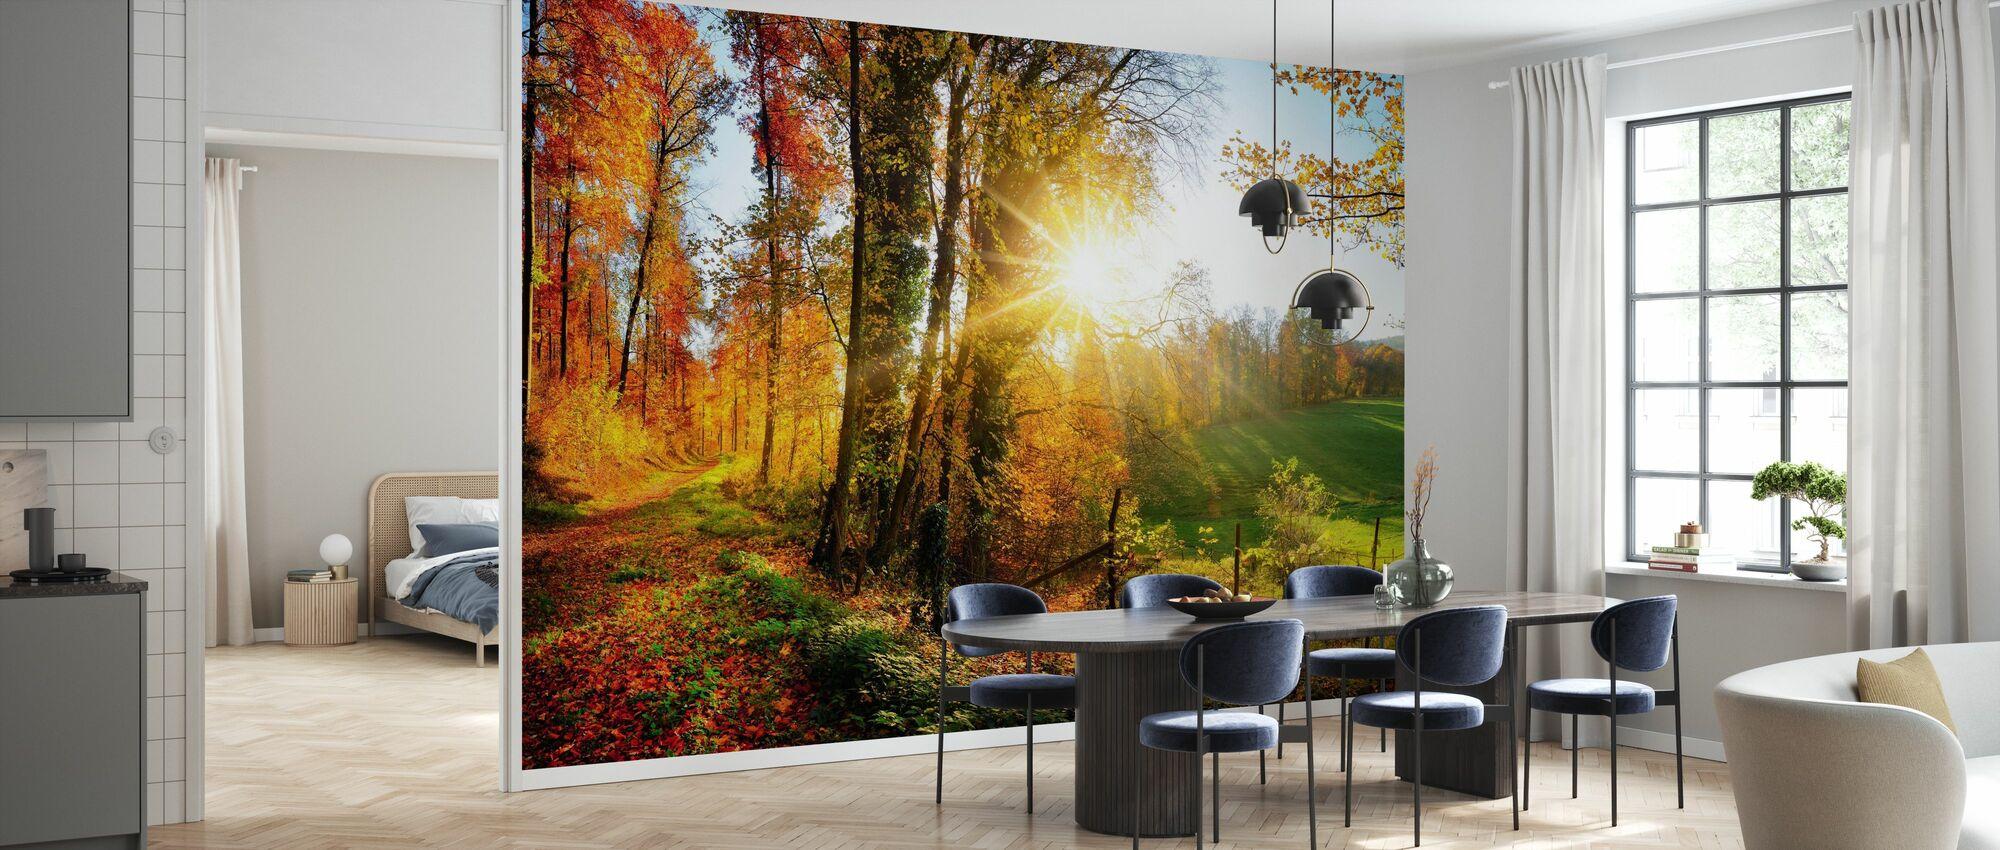 Hermoso paisaje - Papel pintado - Cocina